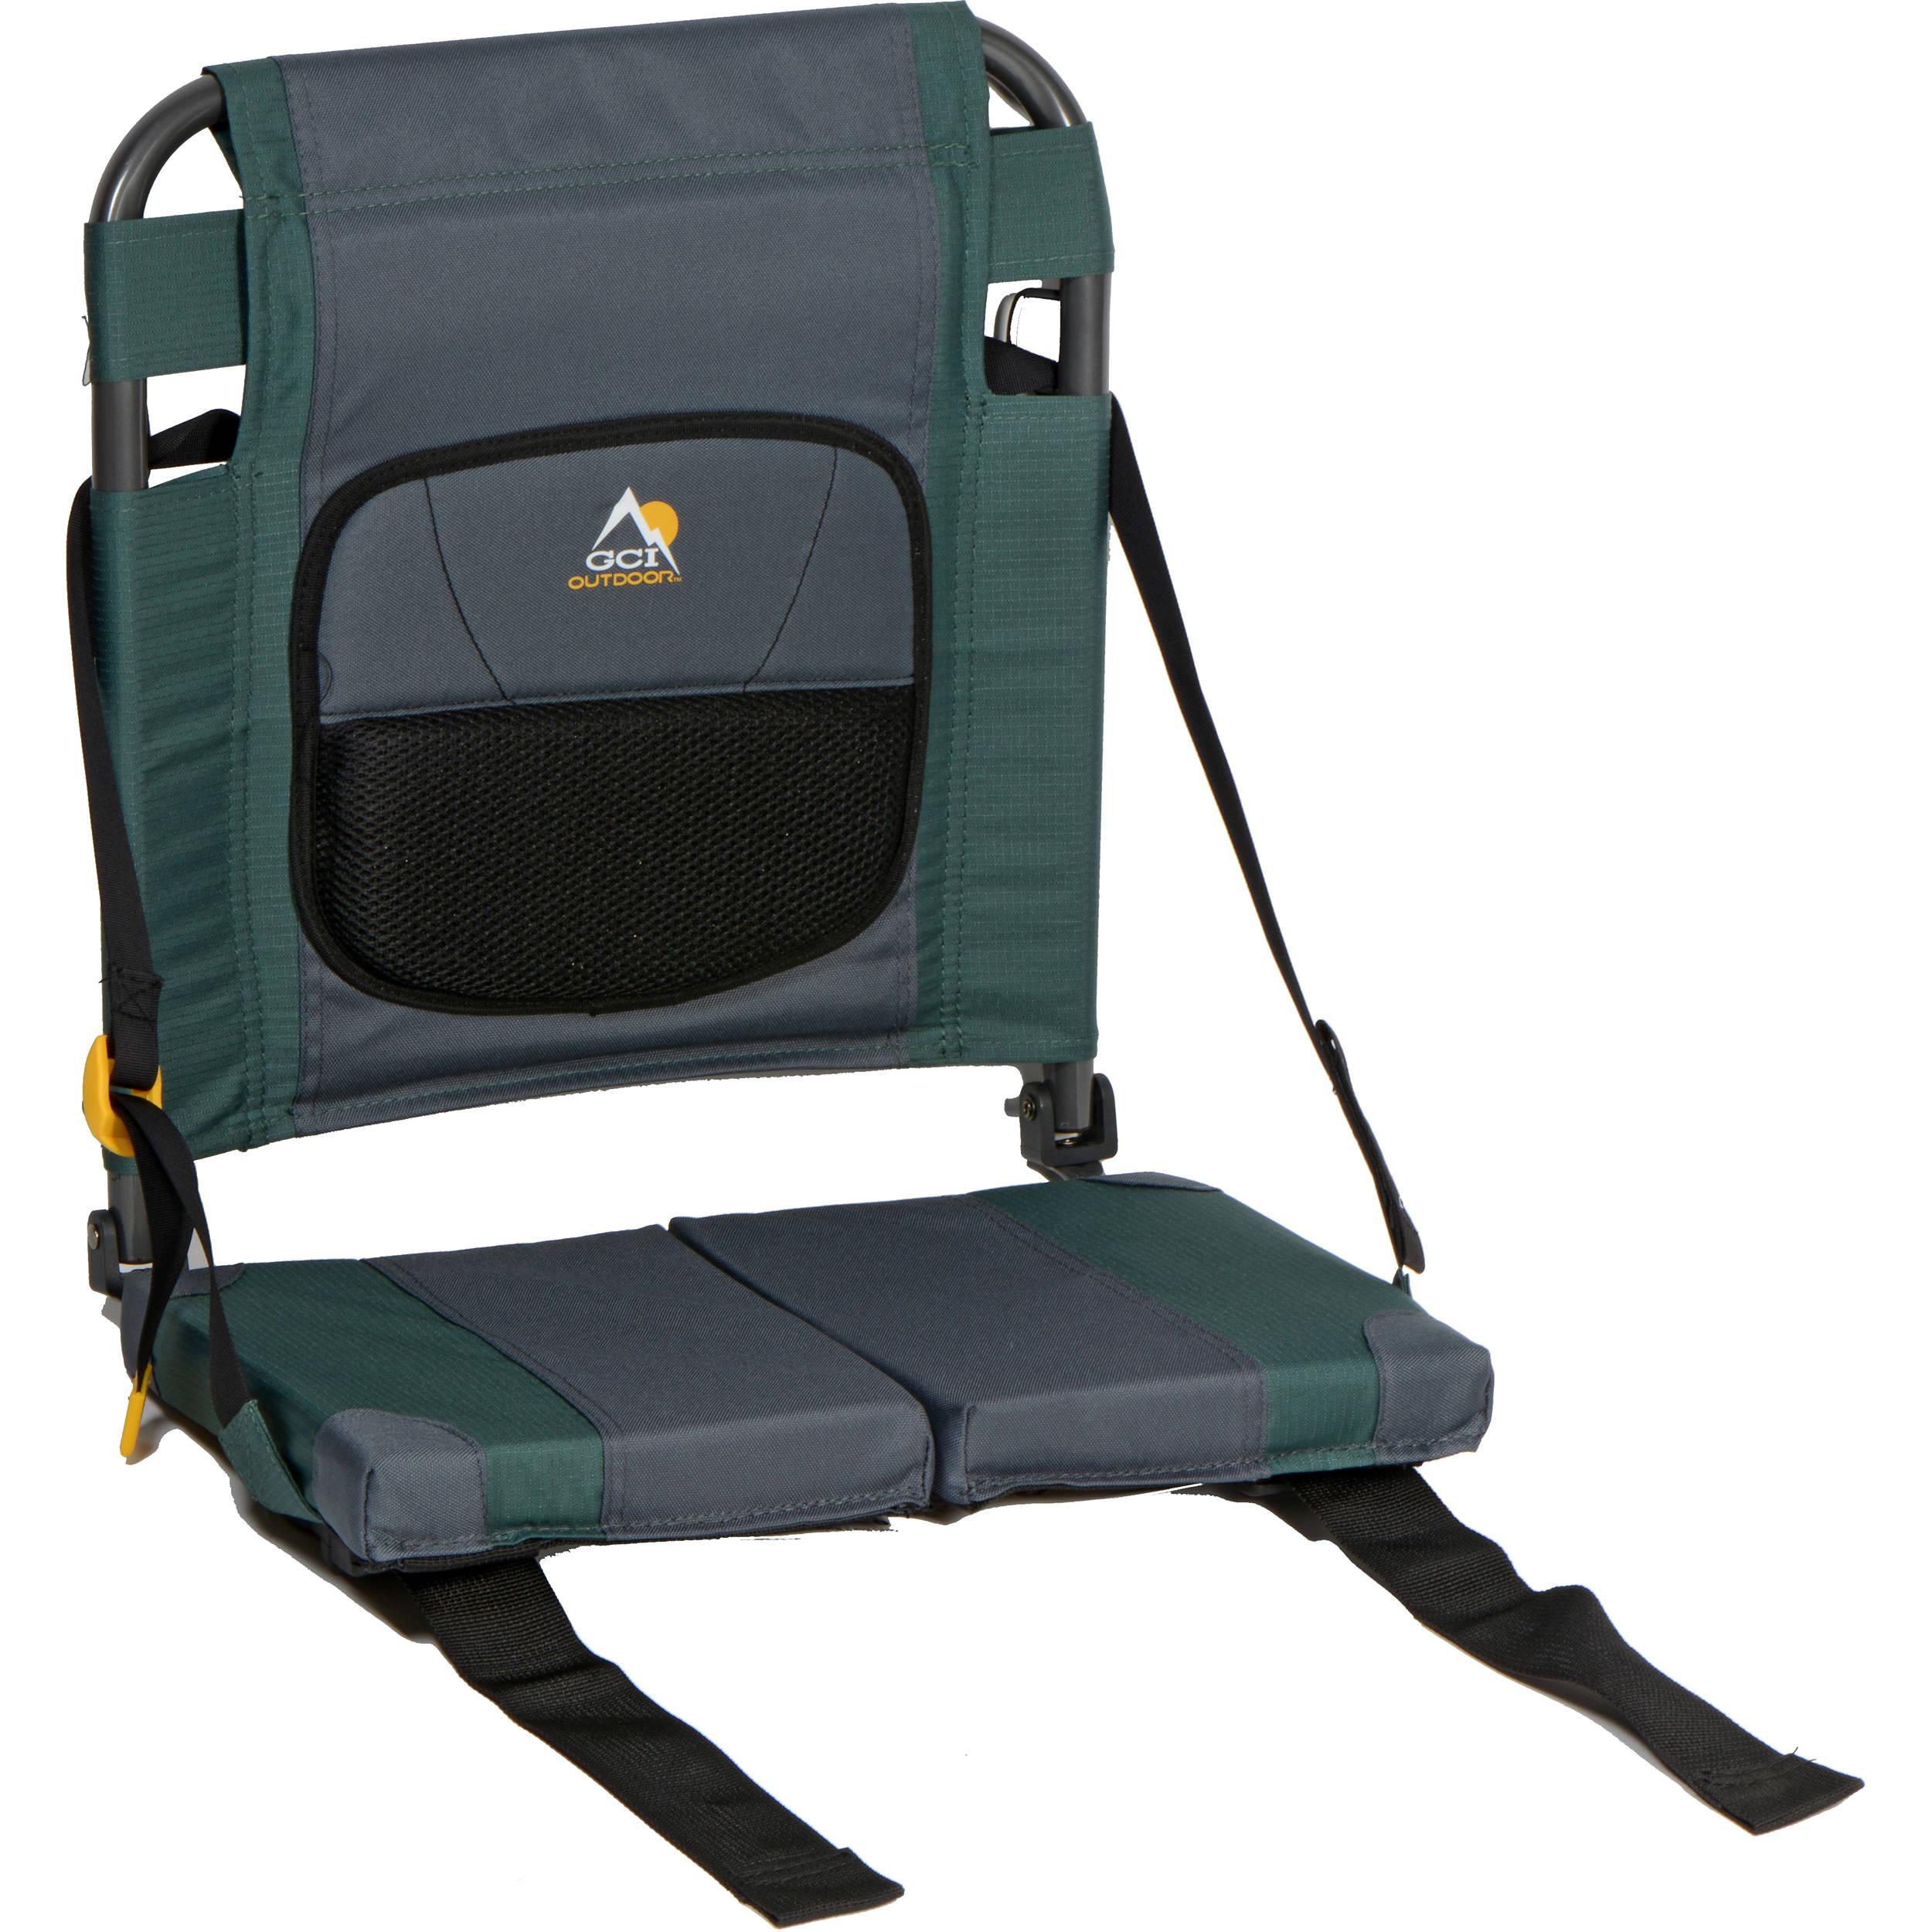 canoe chair ergonomic work gci outdoor sitbacker seat hunter 21012 b andh photo